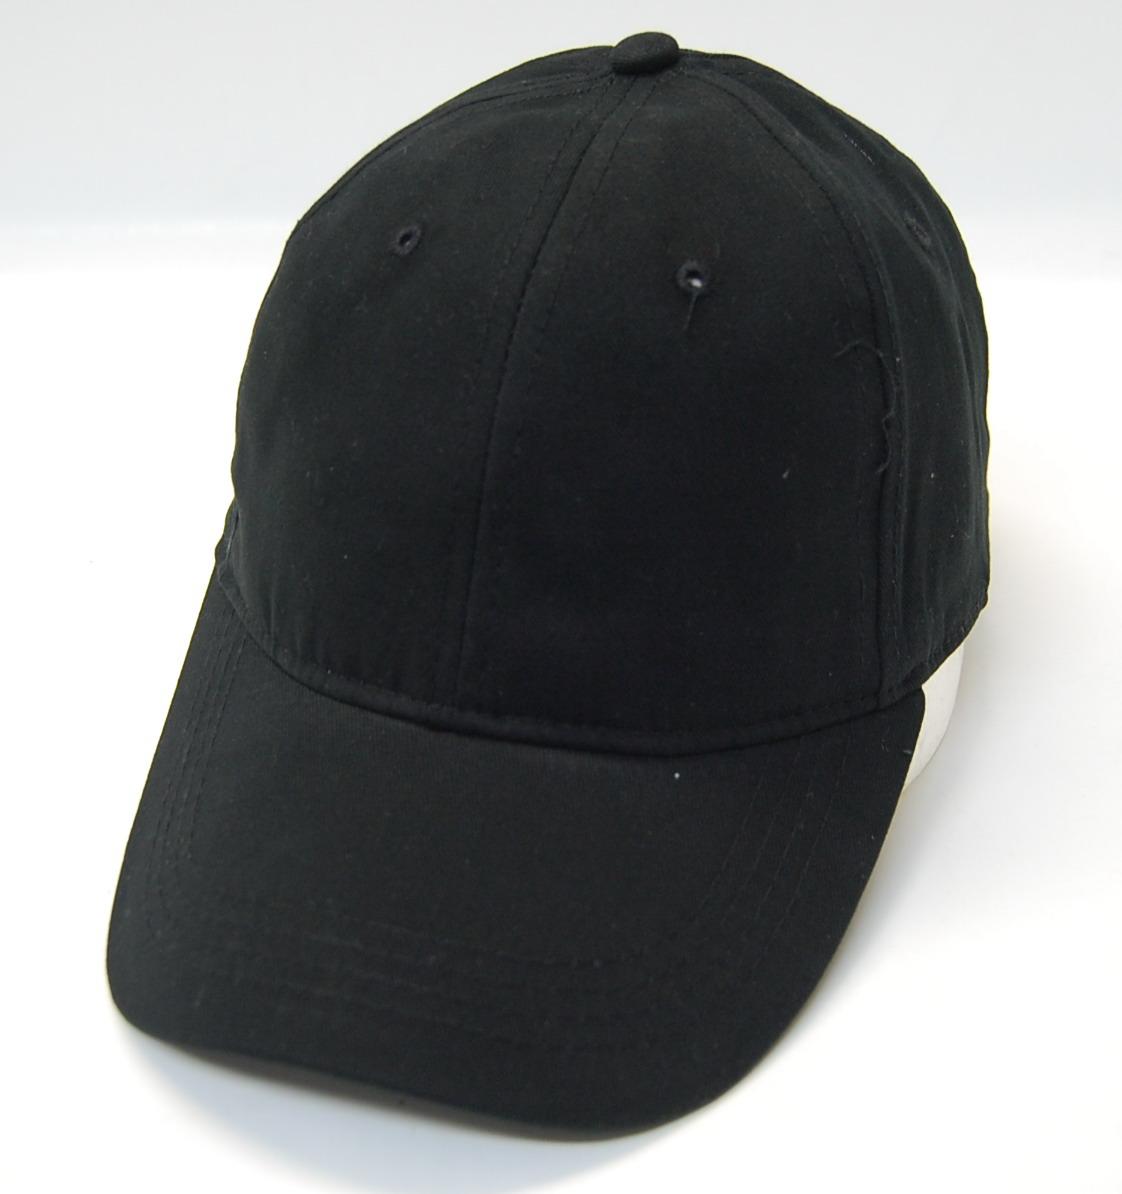 CT6455 - Black